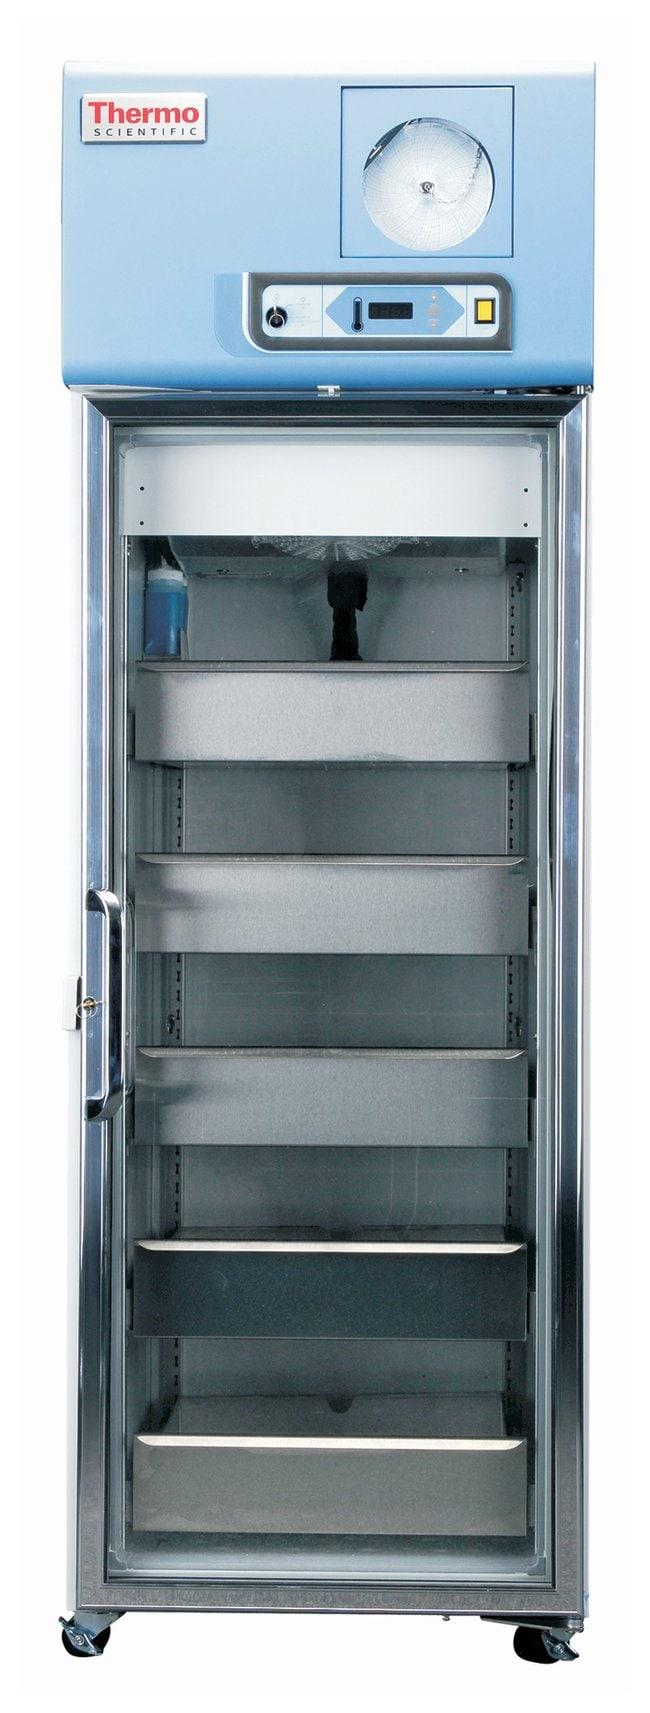 Thermo Scientific Revco Pharmacy Refrigerators 11.5 cu. ft., 115V 60Hz:Cold